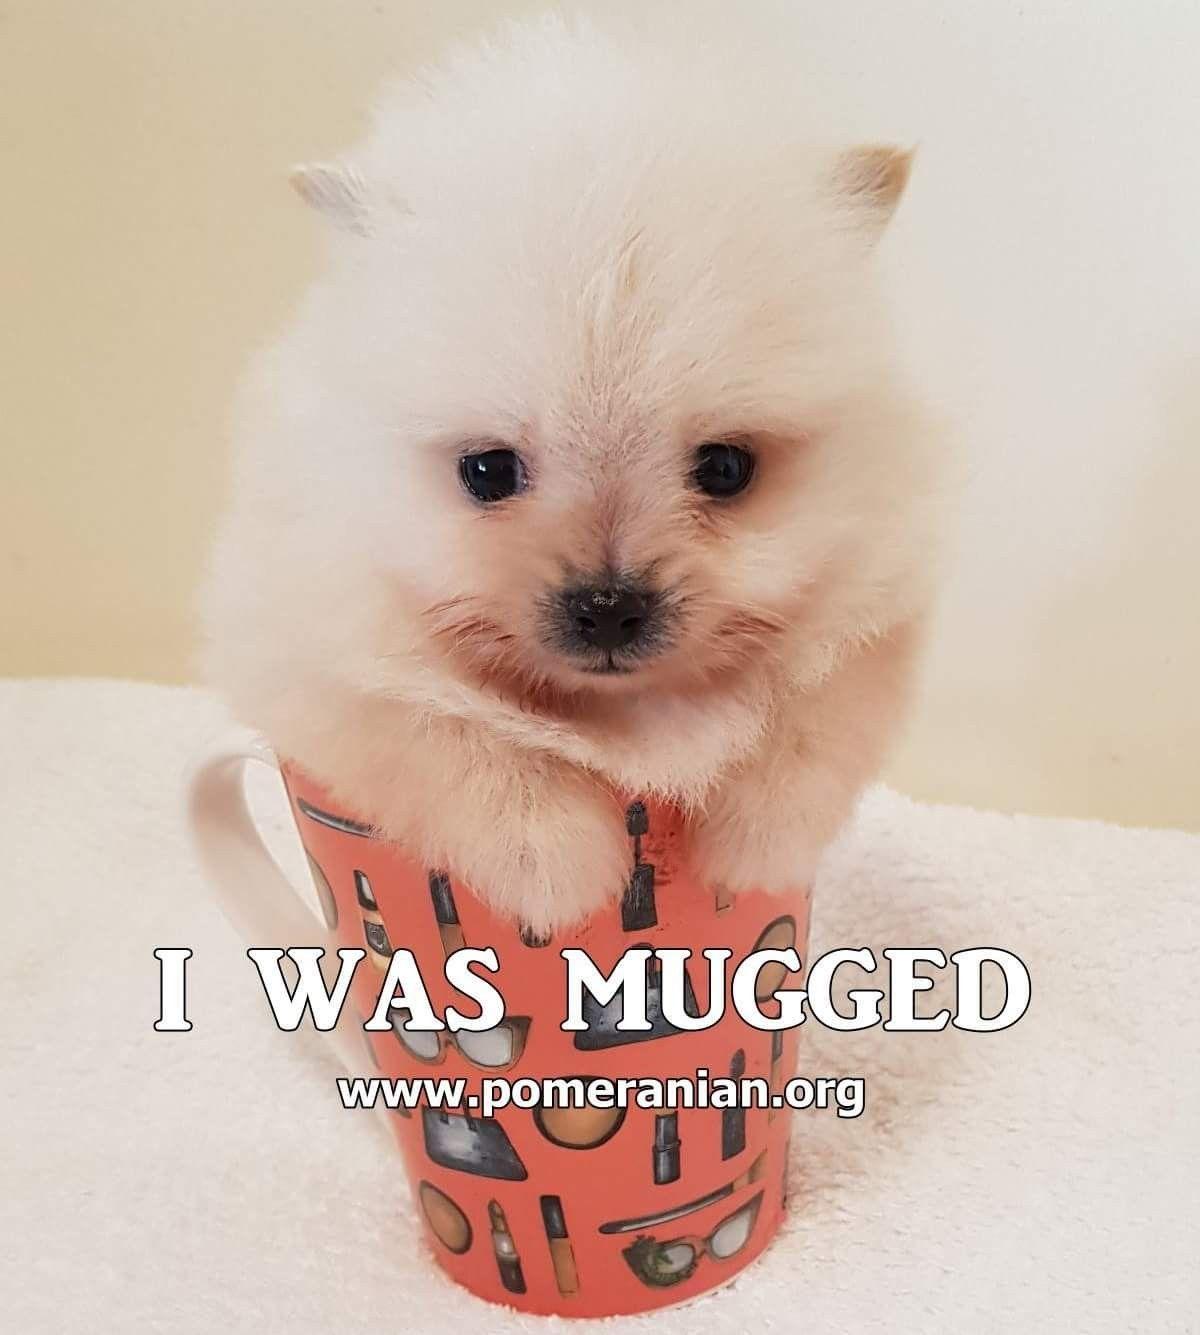 Pin By Rachel Niec Hernandez On Pomeranian Memes Cute Pomeranian Toy Dog Breeds Pomeranian Memes